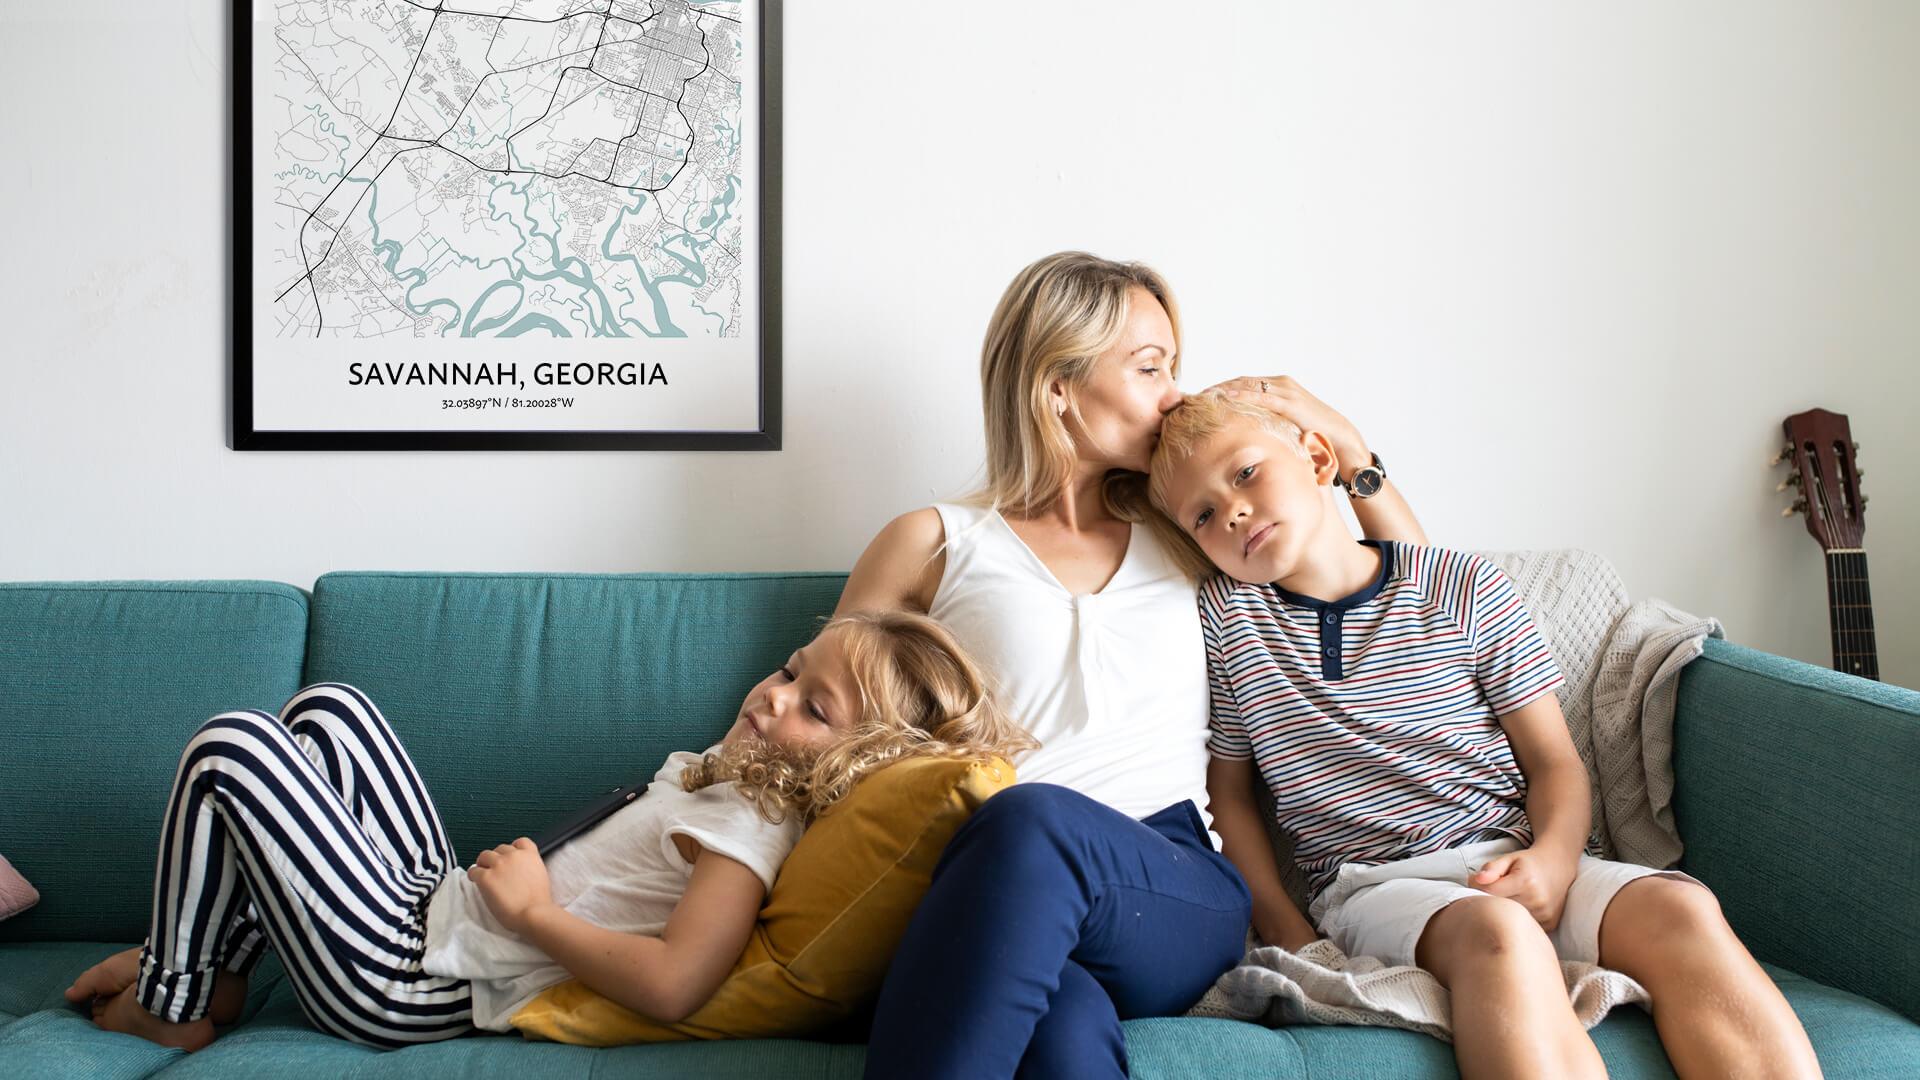 Savannah map poster